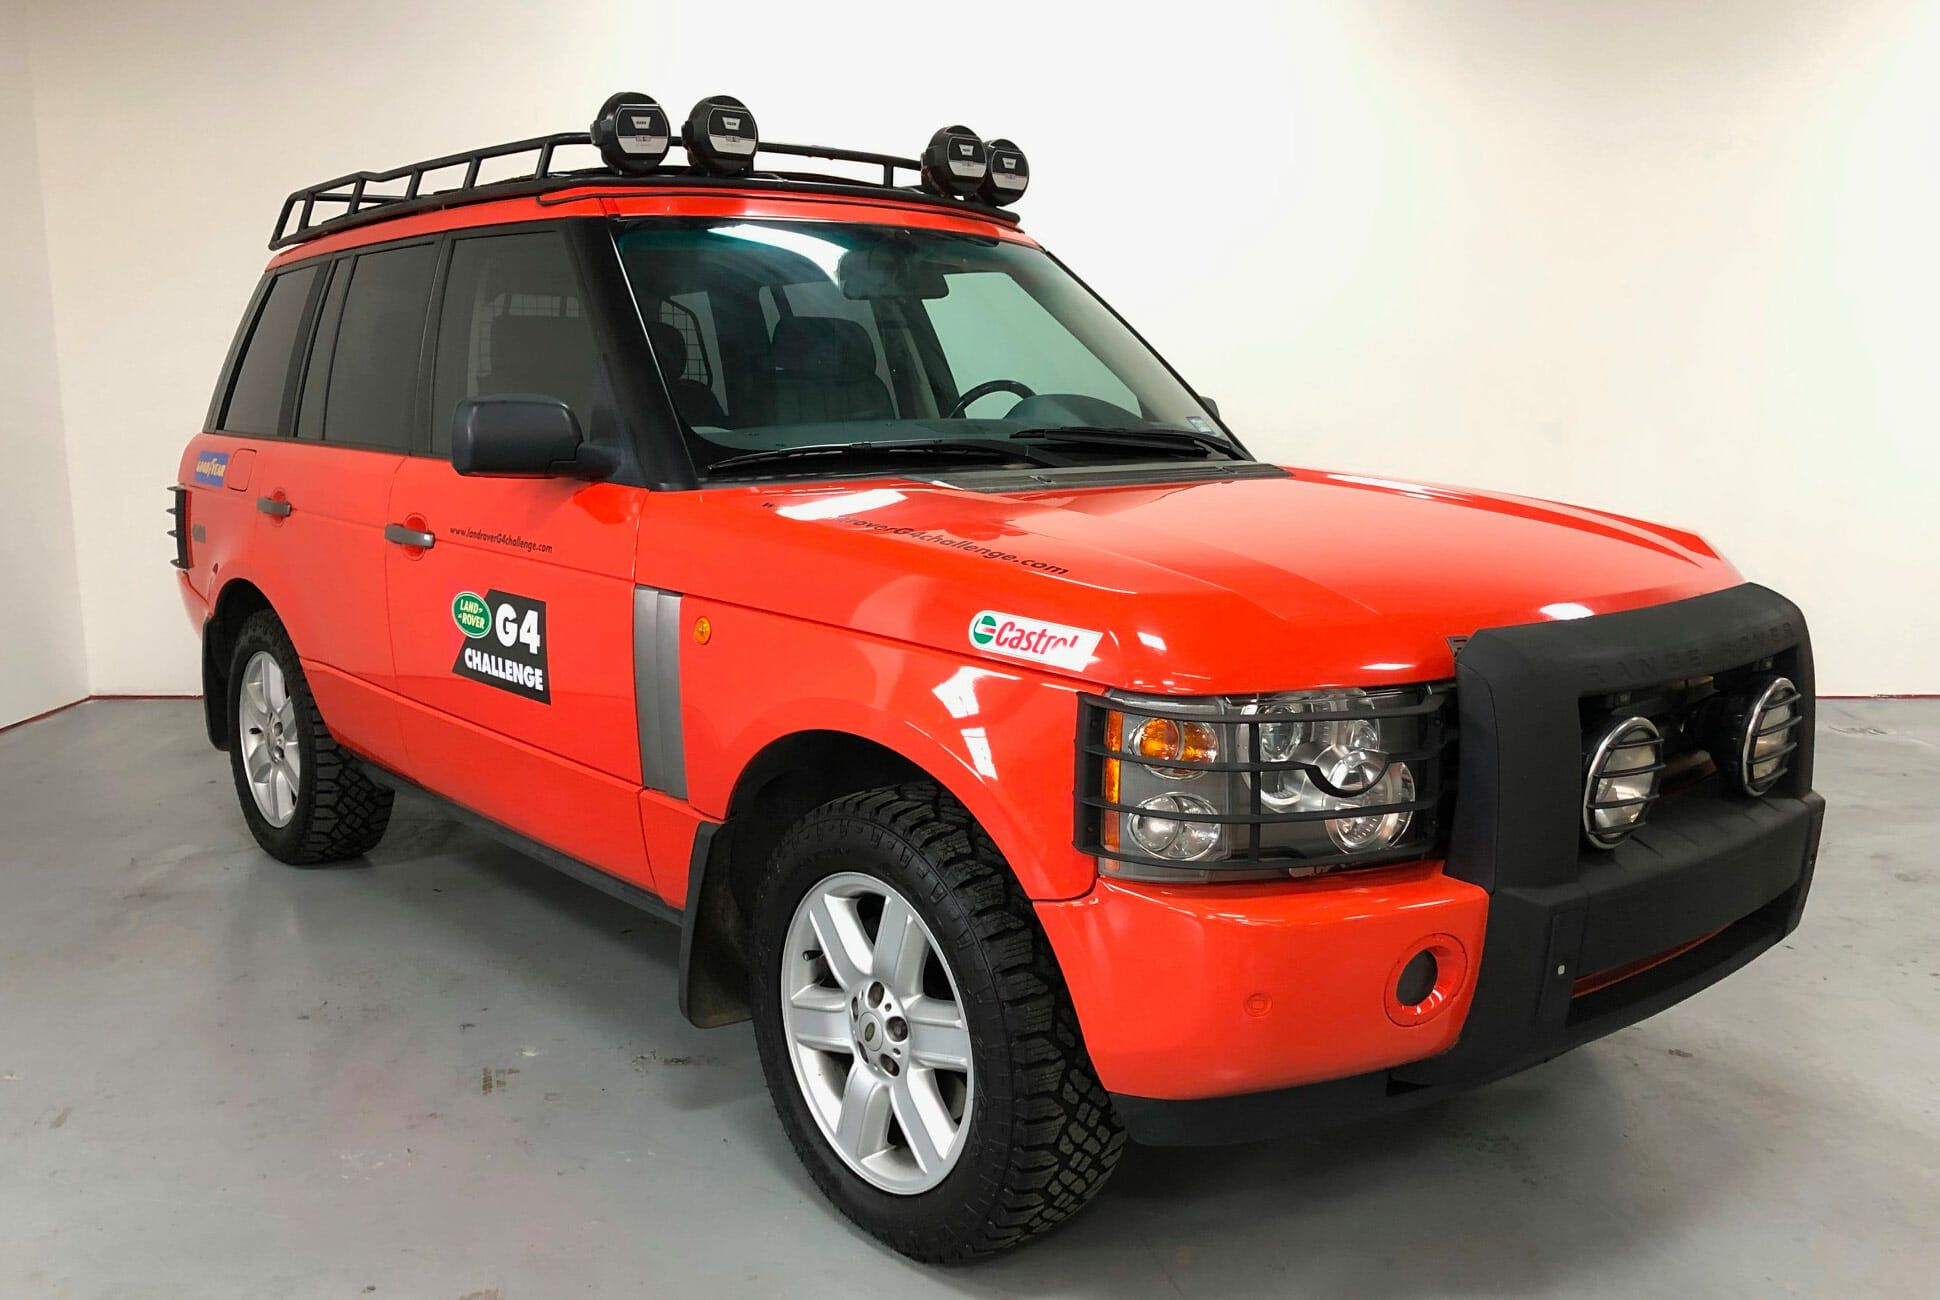 2003-Land-Rover-Range-Rover-G4-gear-patrol-slide-1